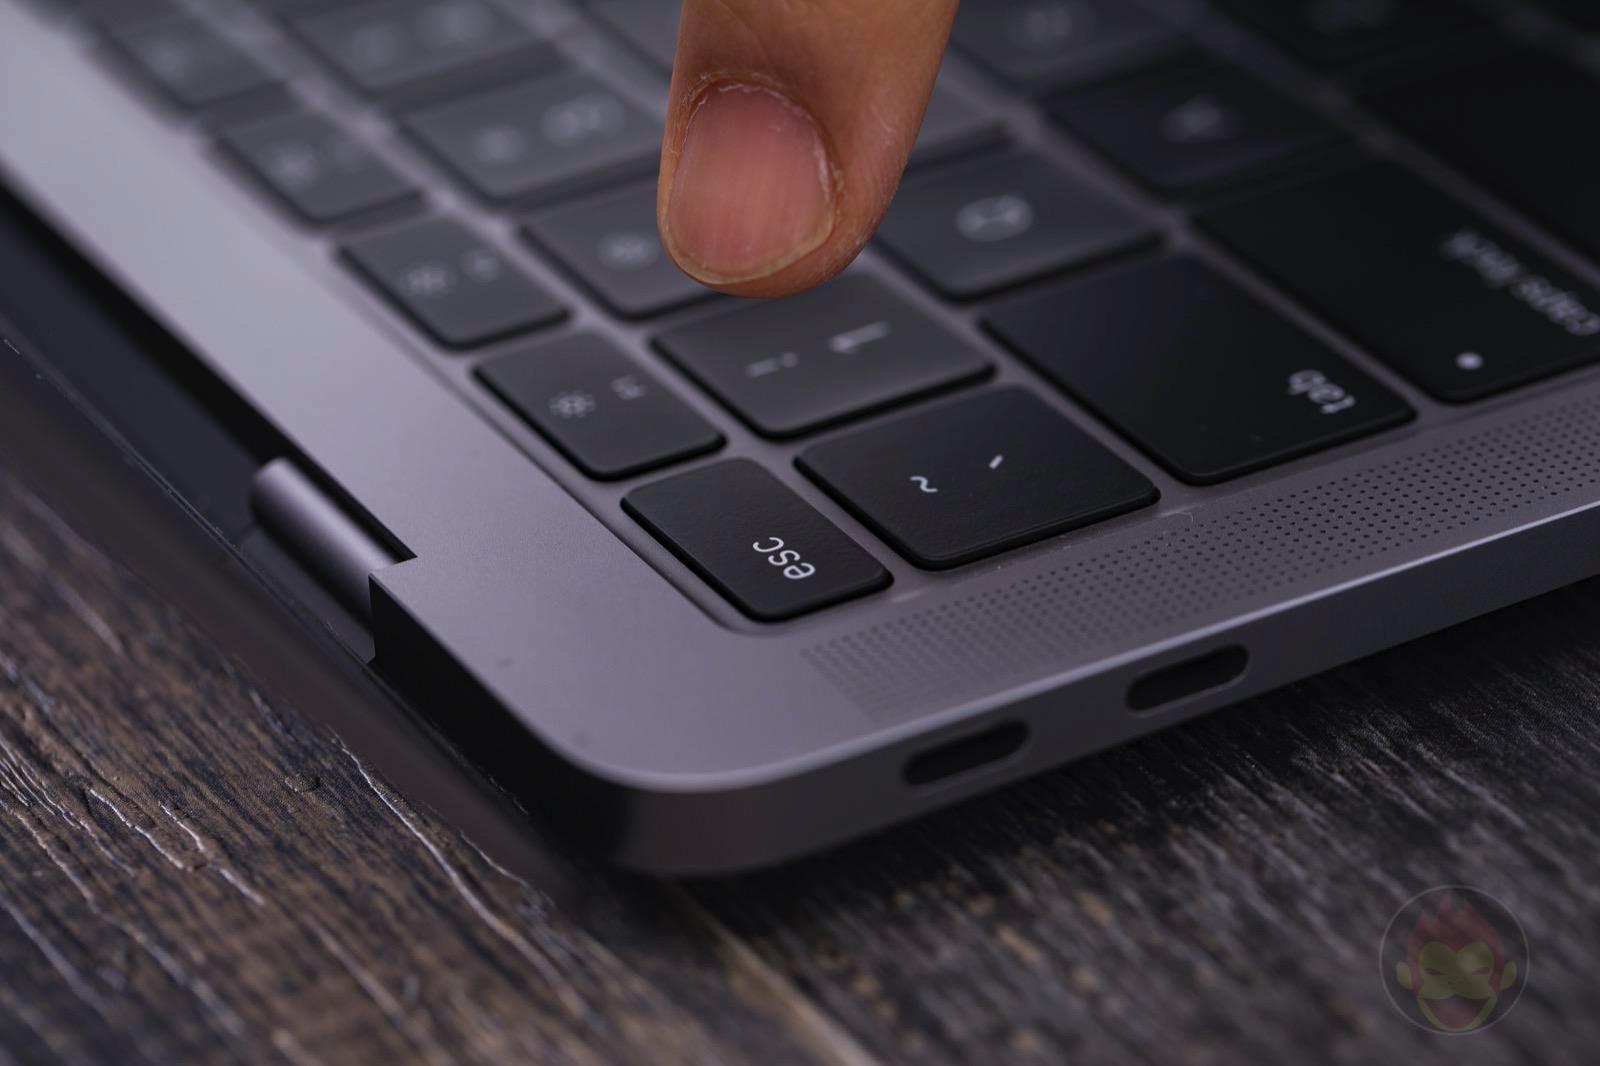 MacBook-Air-2018-Review-14.jpg